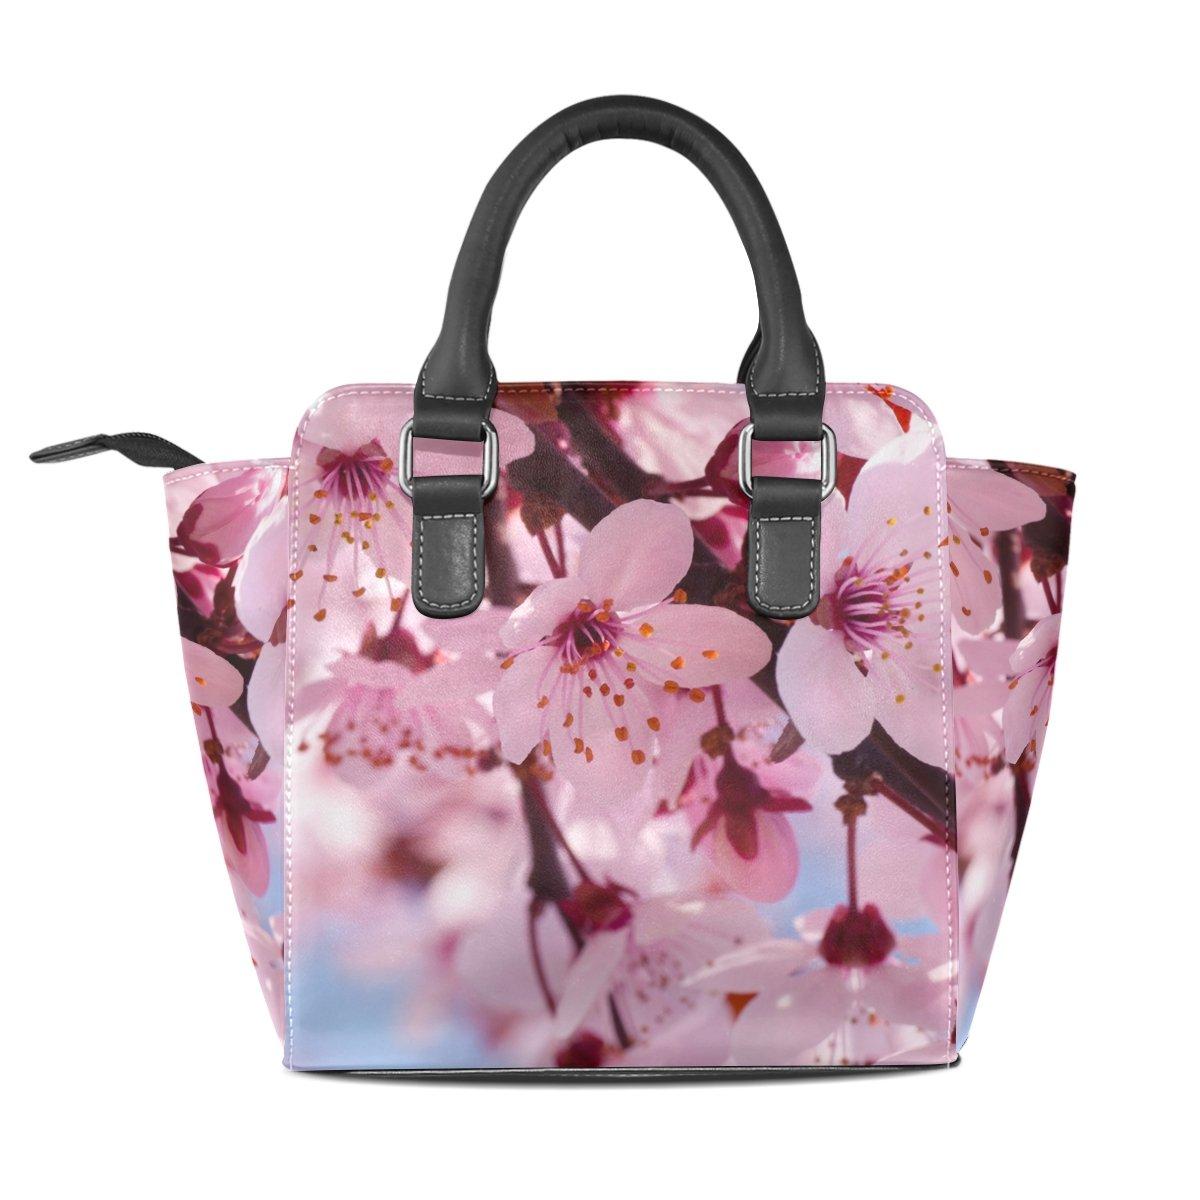 Jennifer PU Leather Top-Handle Handbags Pink Cherry Blossom Flowers Single-Shoulder Tote Crossbody Bag Messenger Bags For Women